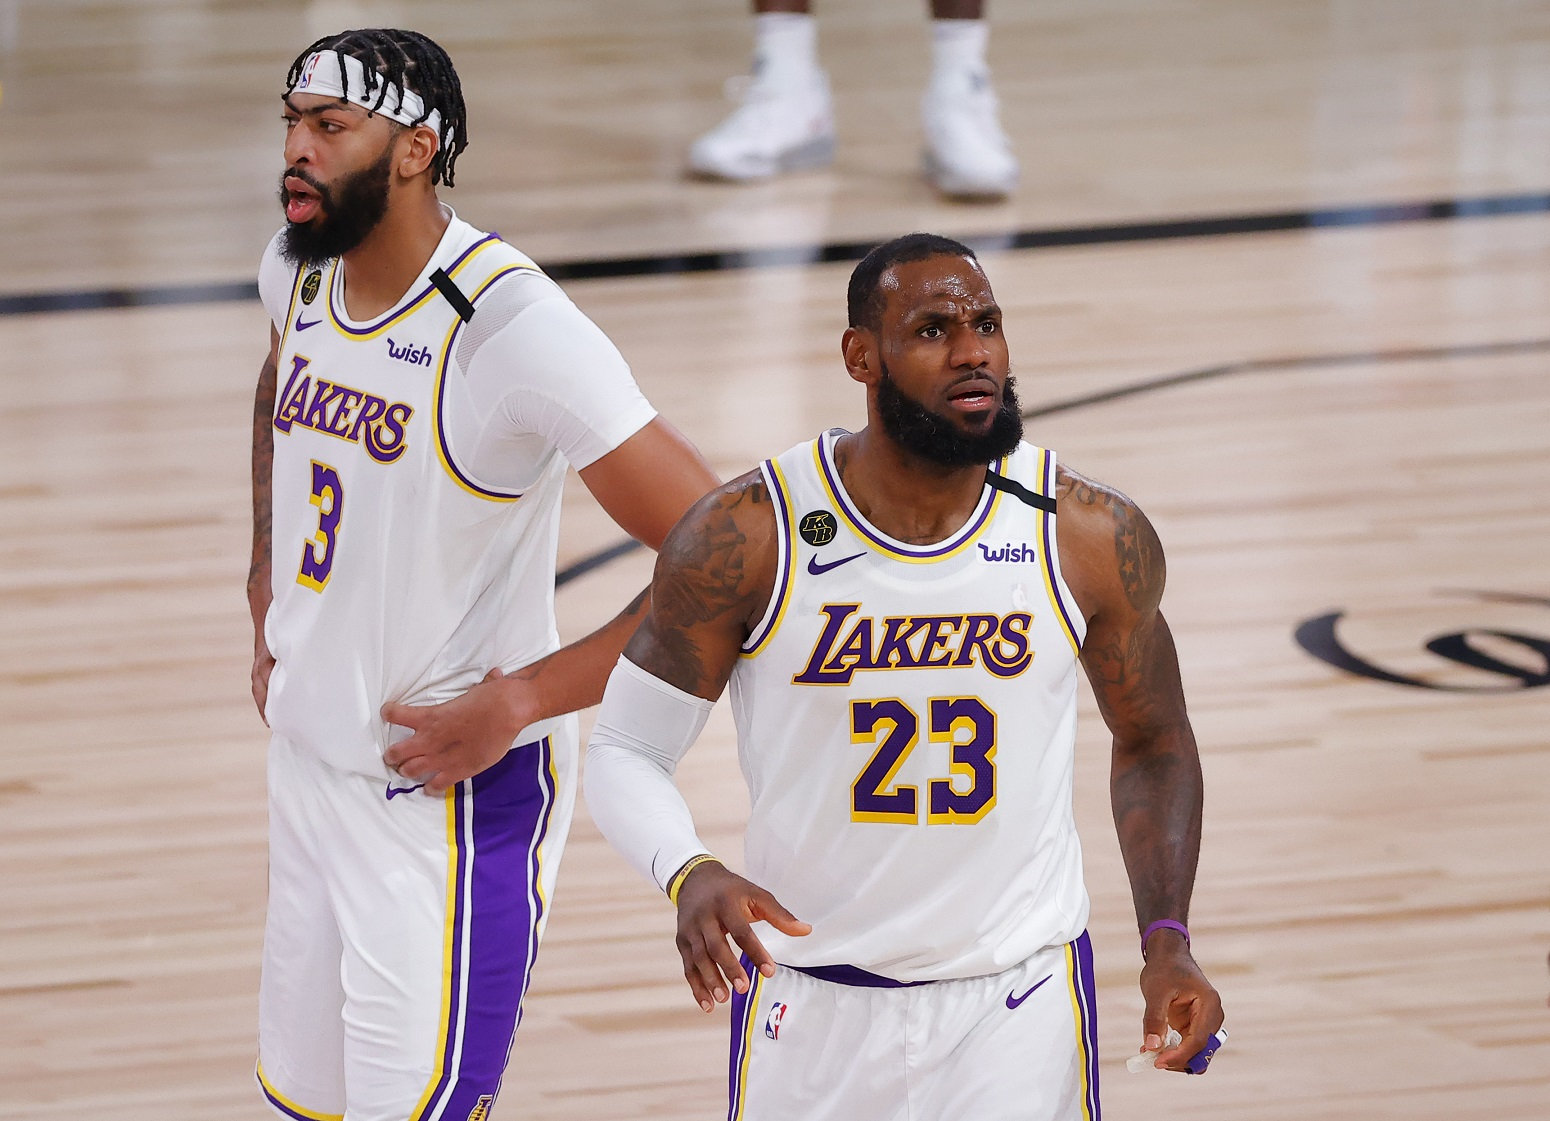 LeBron James NBA Finals fans outraged